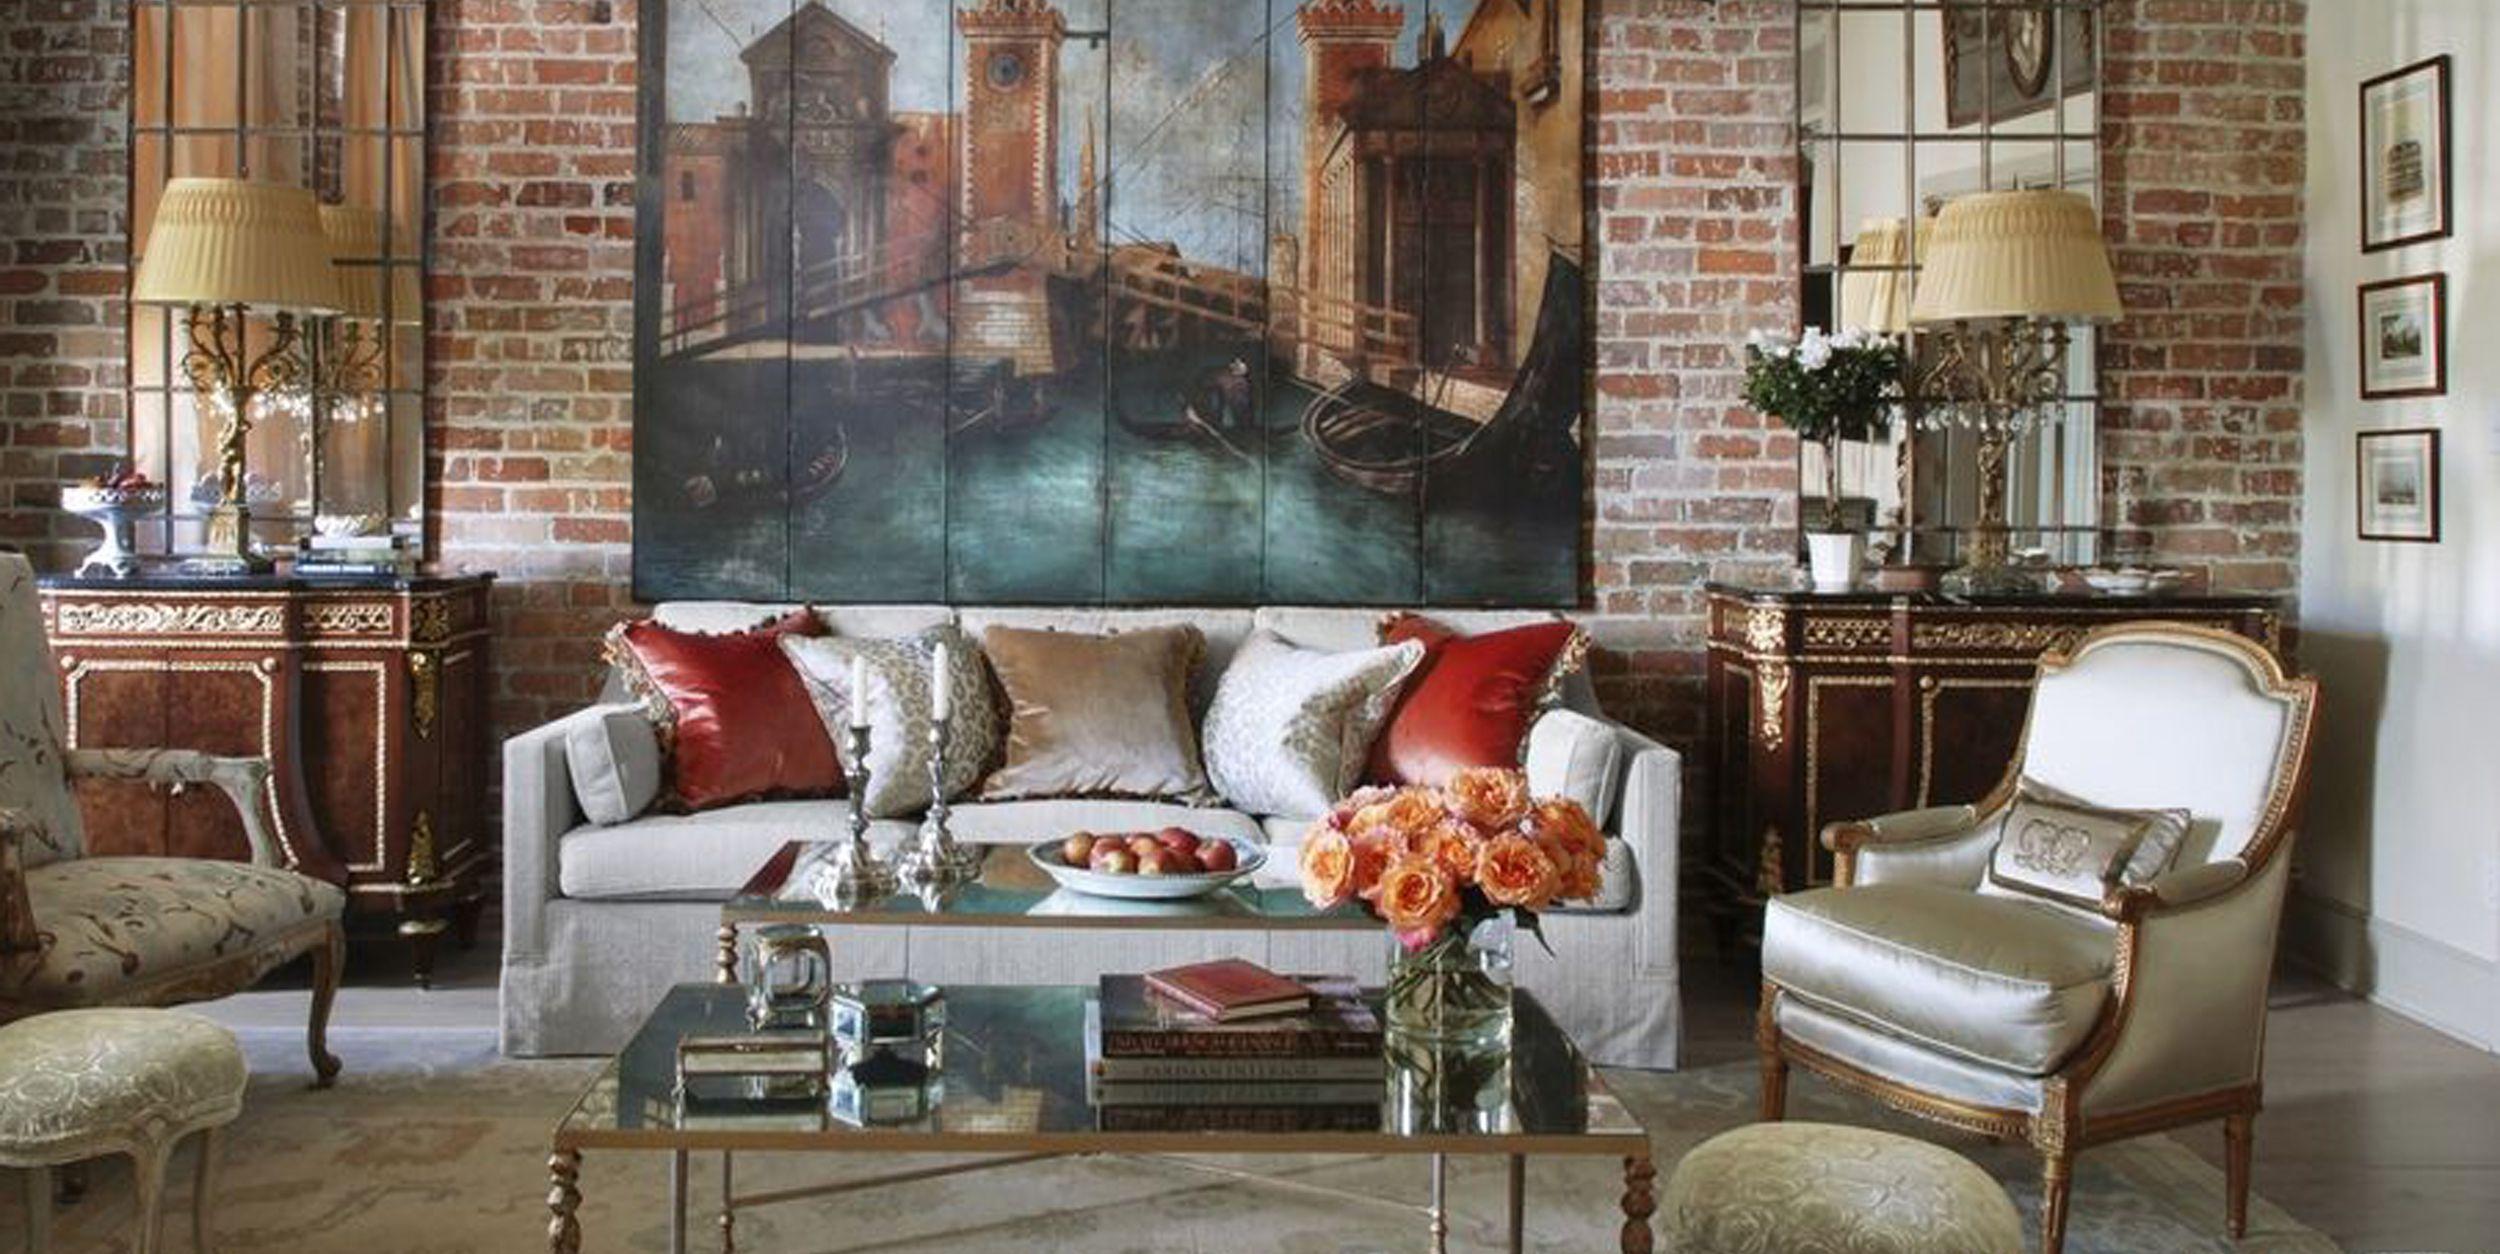 18 Rustic Rooms That Look So Cozy